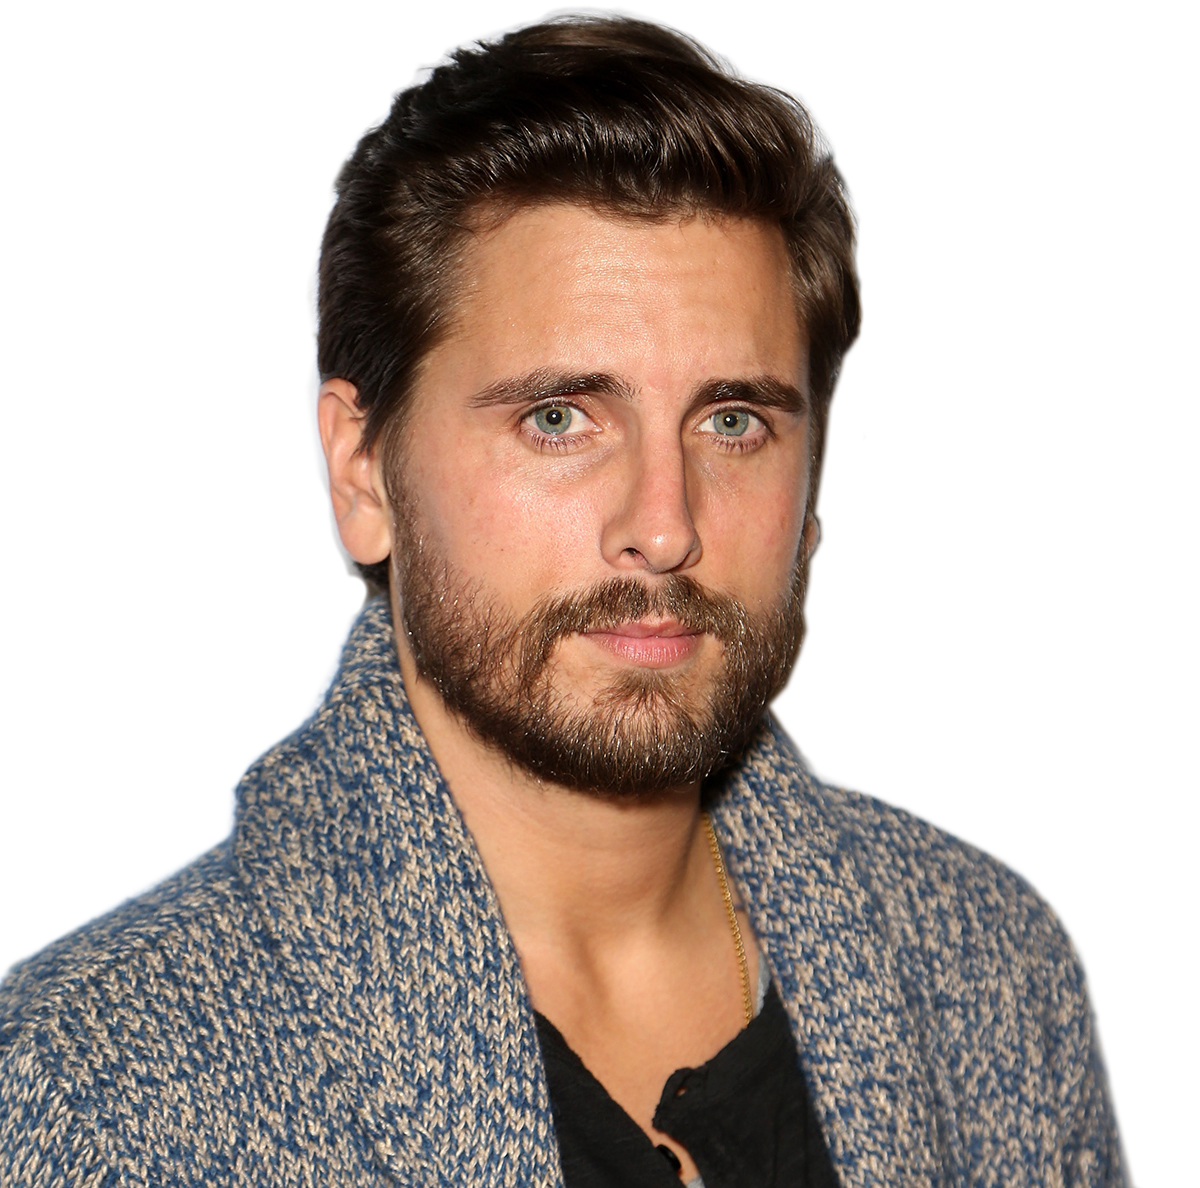 TV personality Scott Disick - age: 34